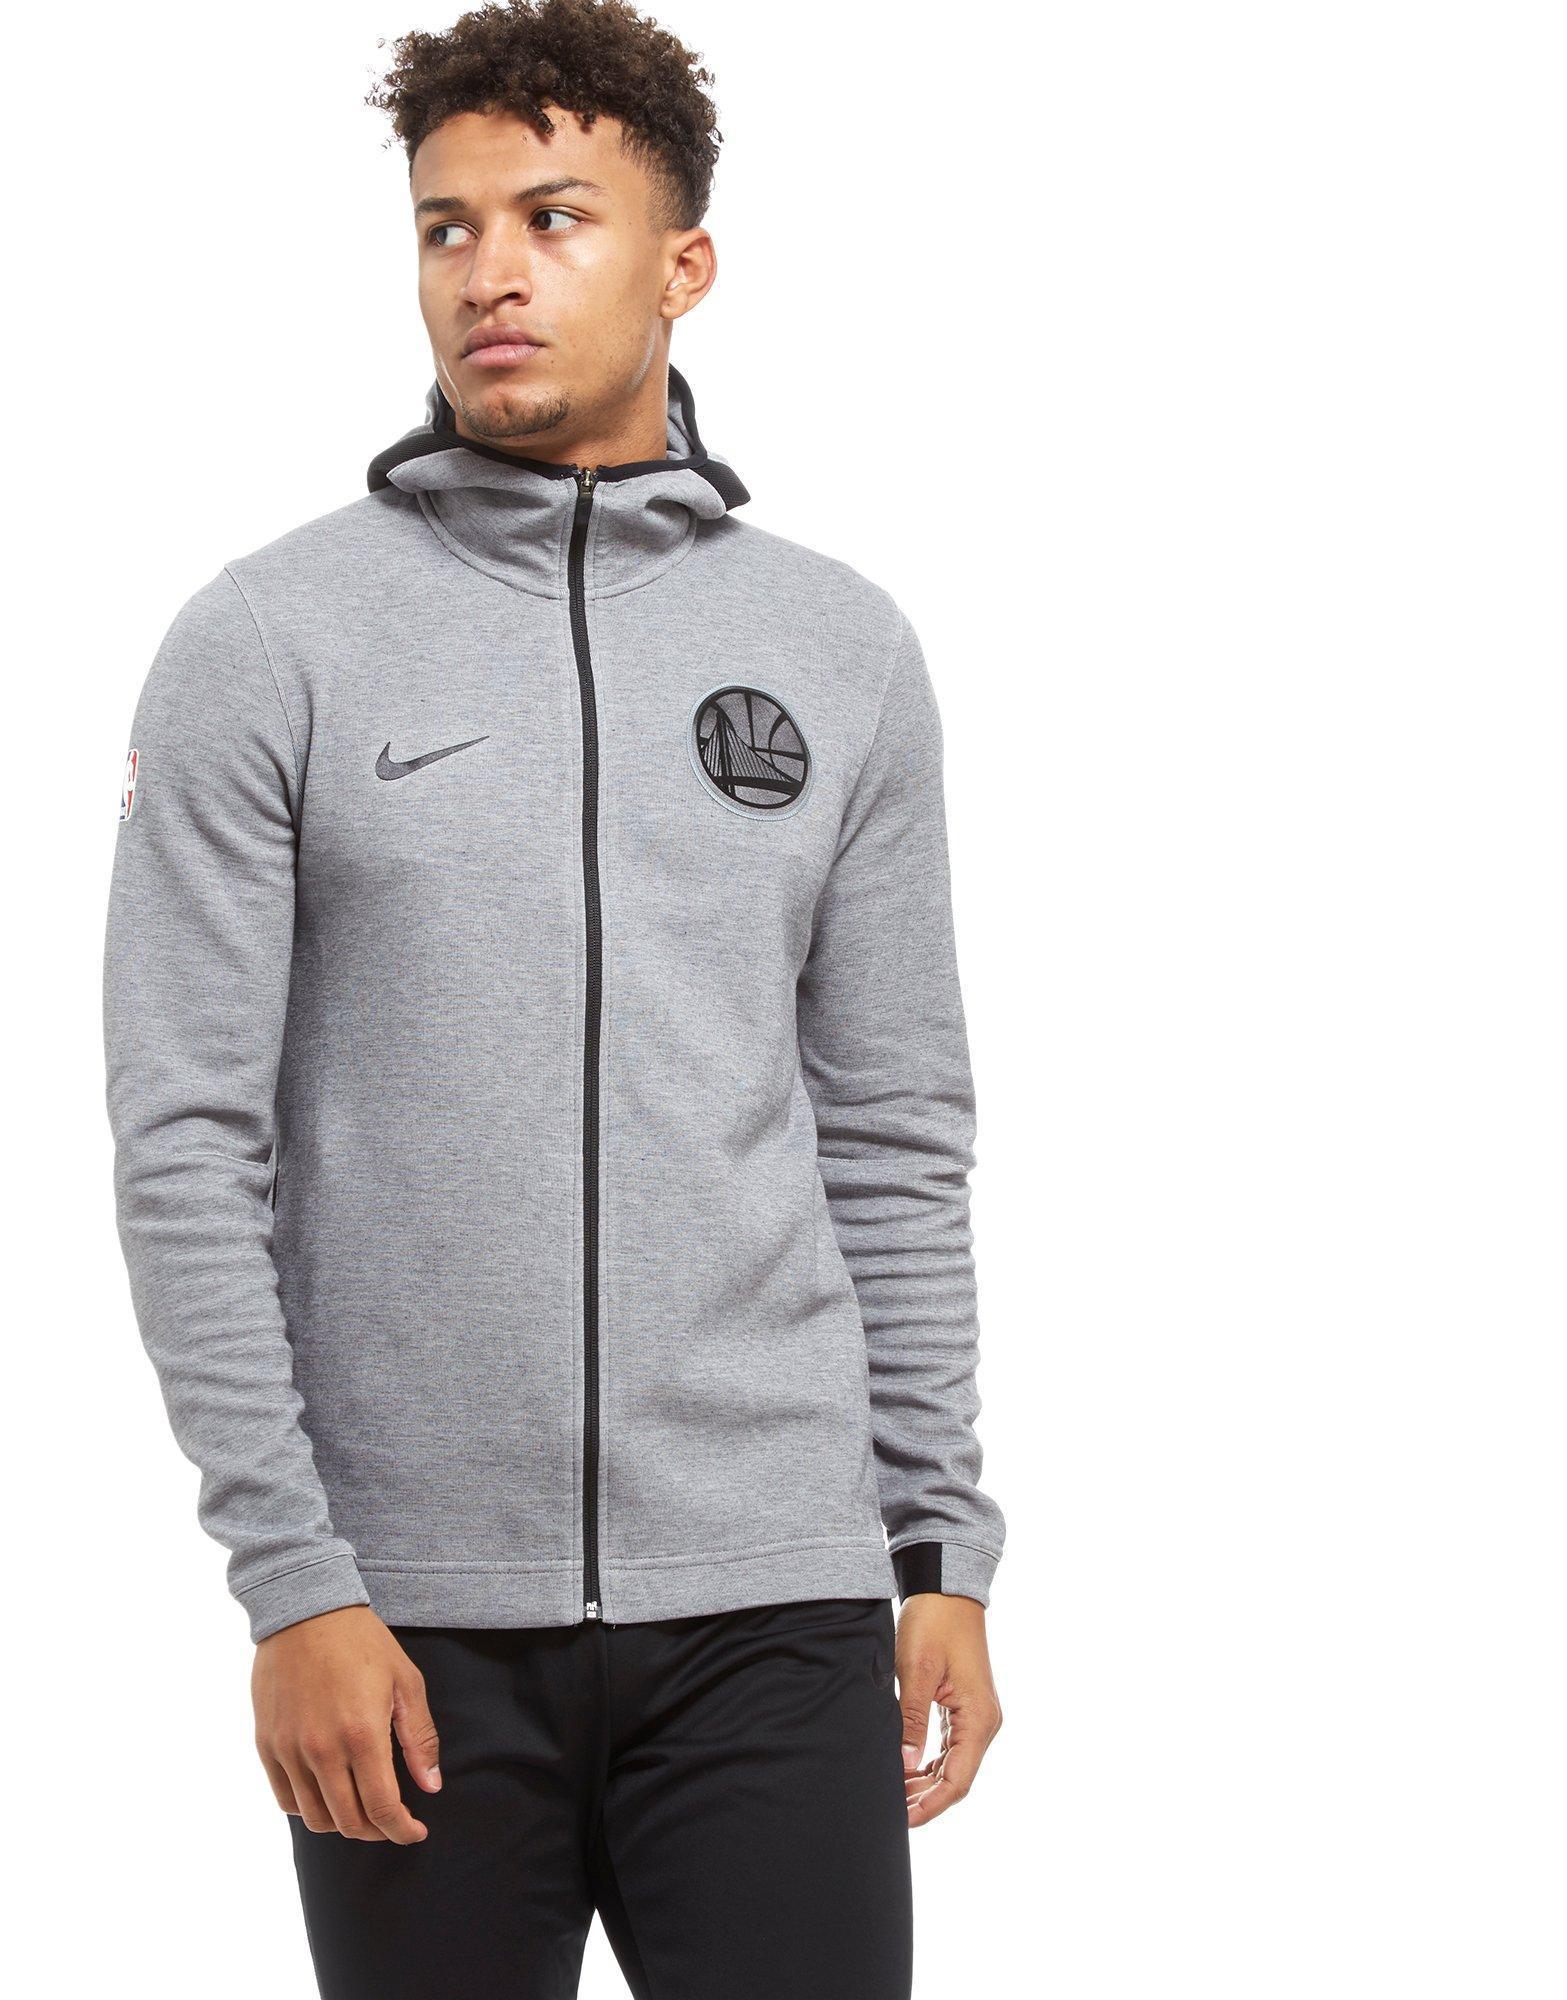 ba3173c04 Nike Nba Golden State Warriors Therma Flex Hoodie in Gray for Men - Lyst